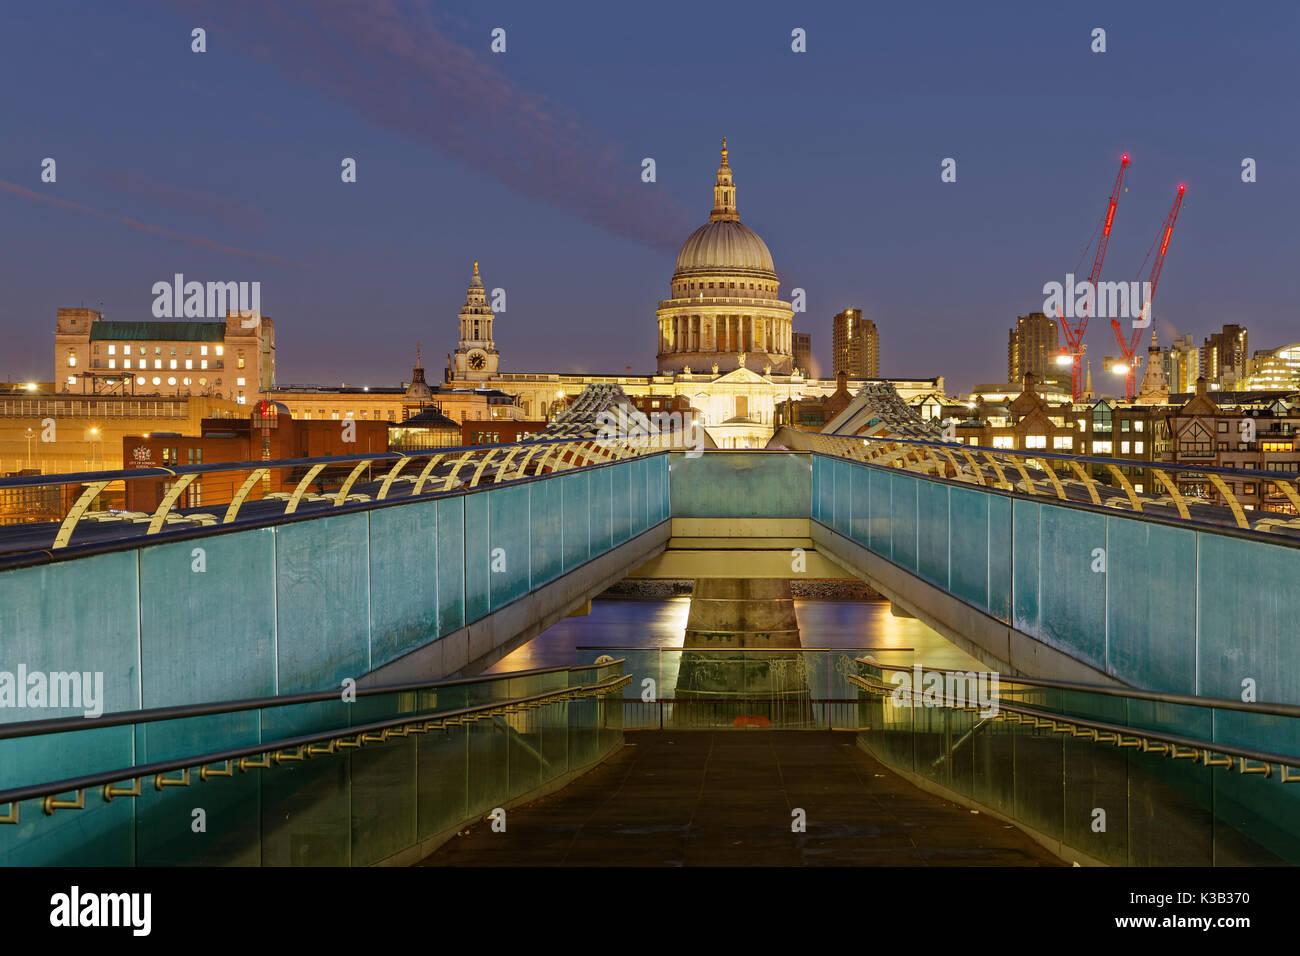 Millennium Bridge and St Paul's Cathedral, London, England, United Kingdom - Stock Image